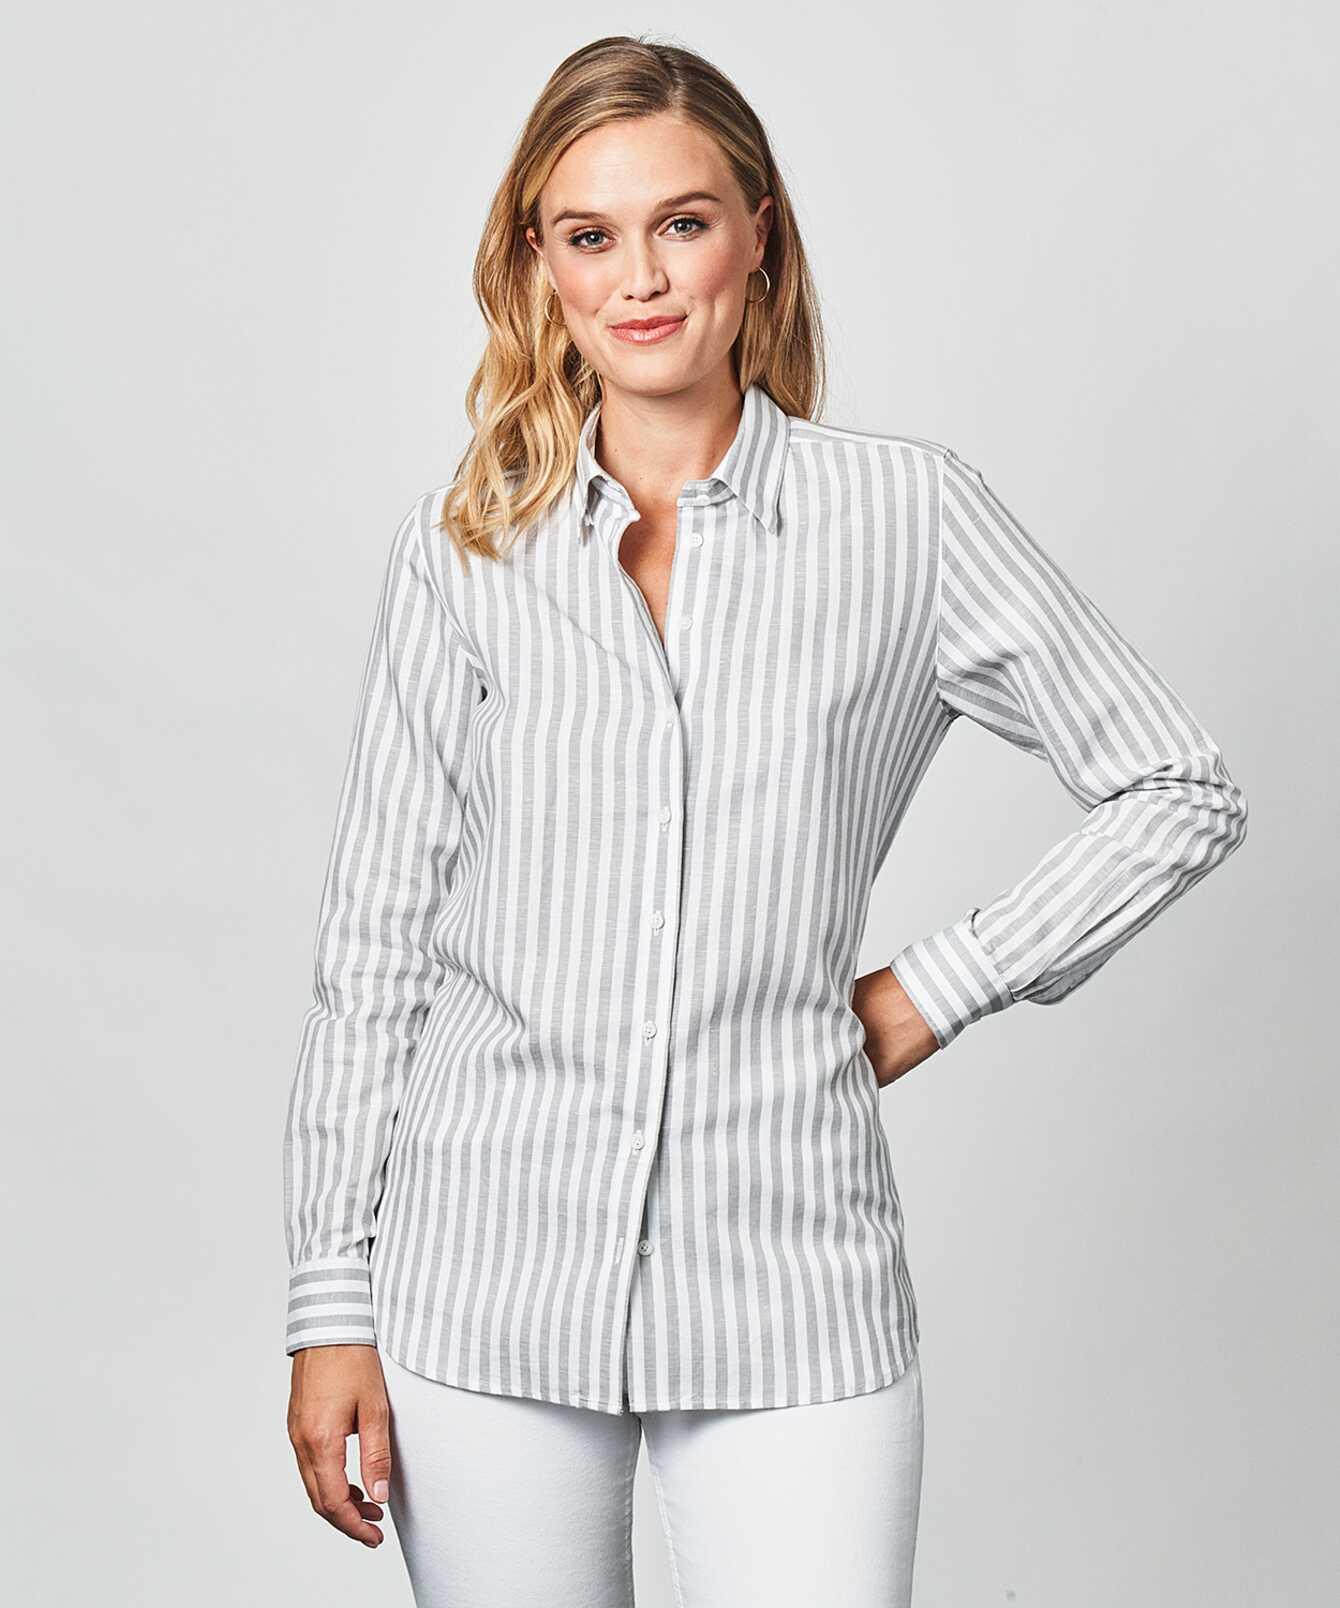 Shirt Mickan Linen Stripe Grey The Shirt Factory